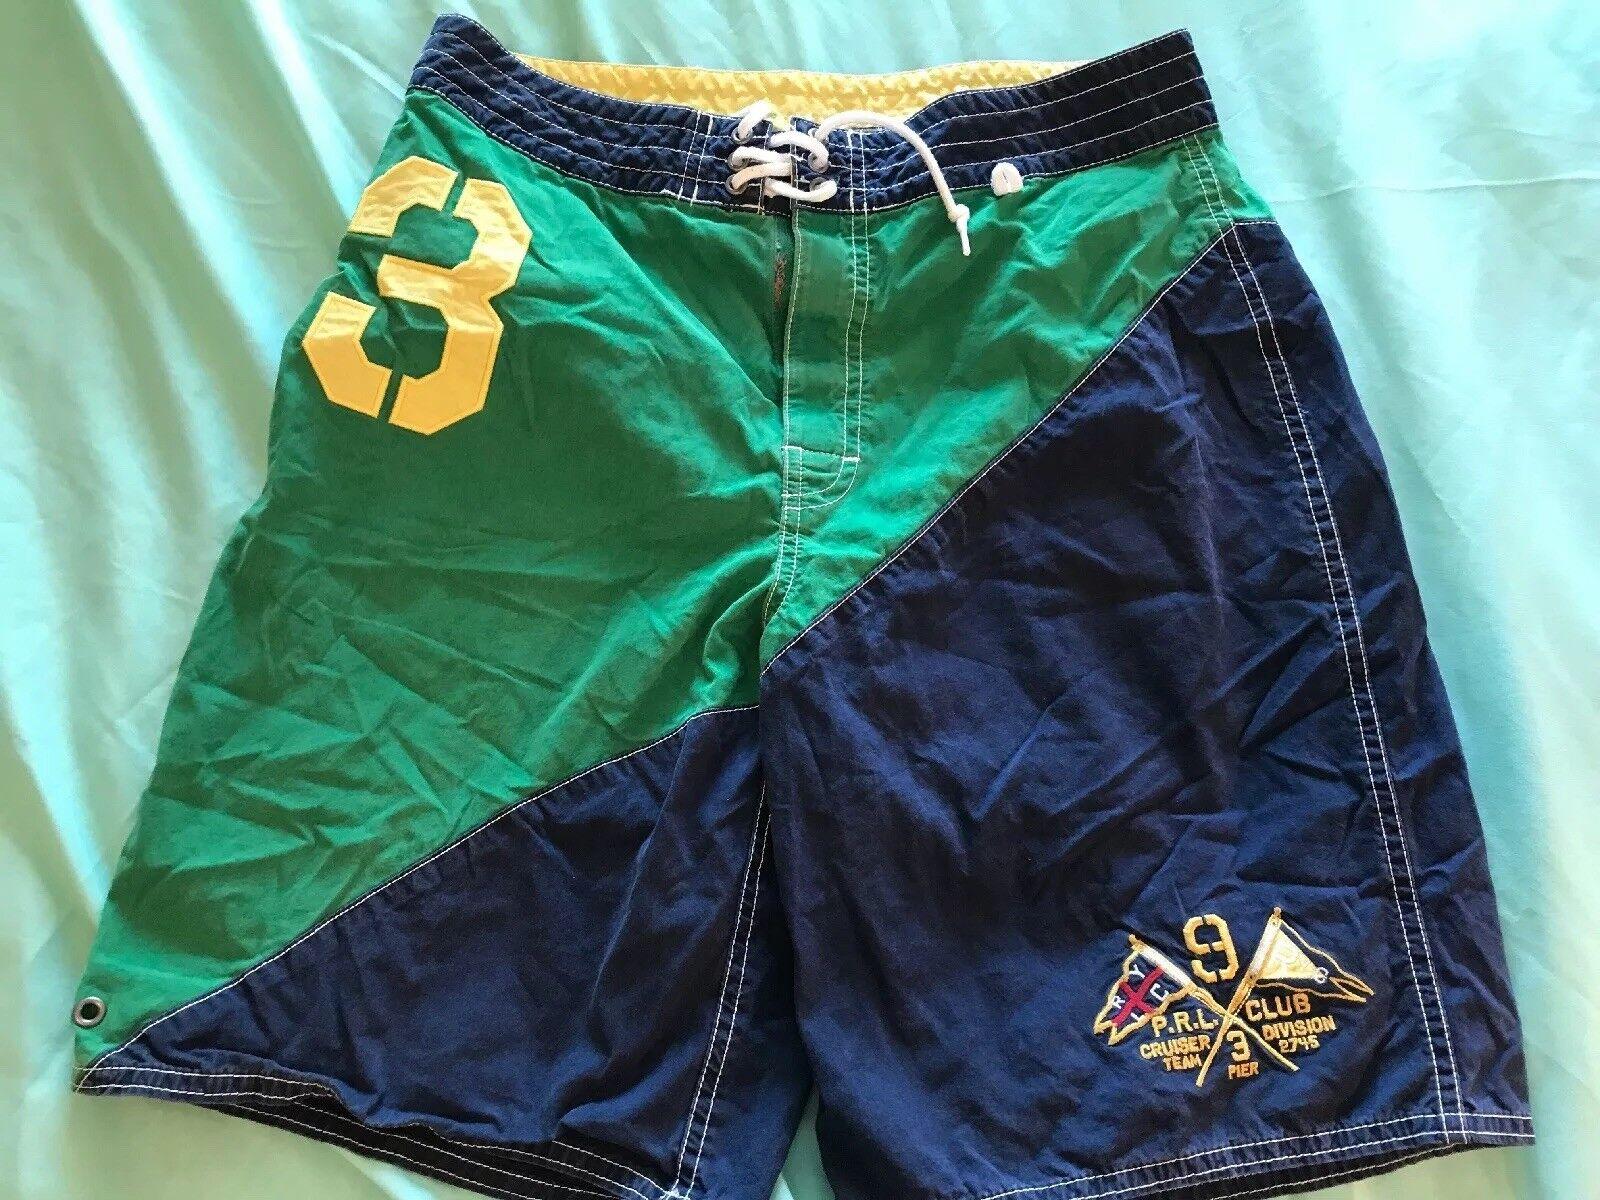 794d7f6f PRL CLUB Polo Ralph Lauren Embroidered Swim Trunks Board Shorts SZ 30 TS8